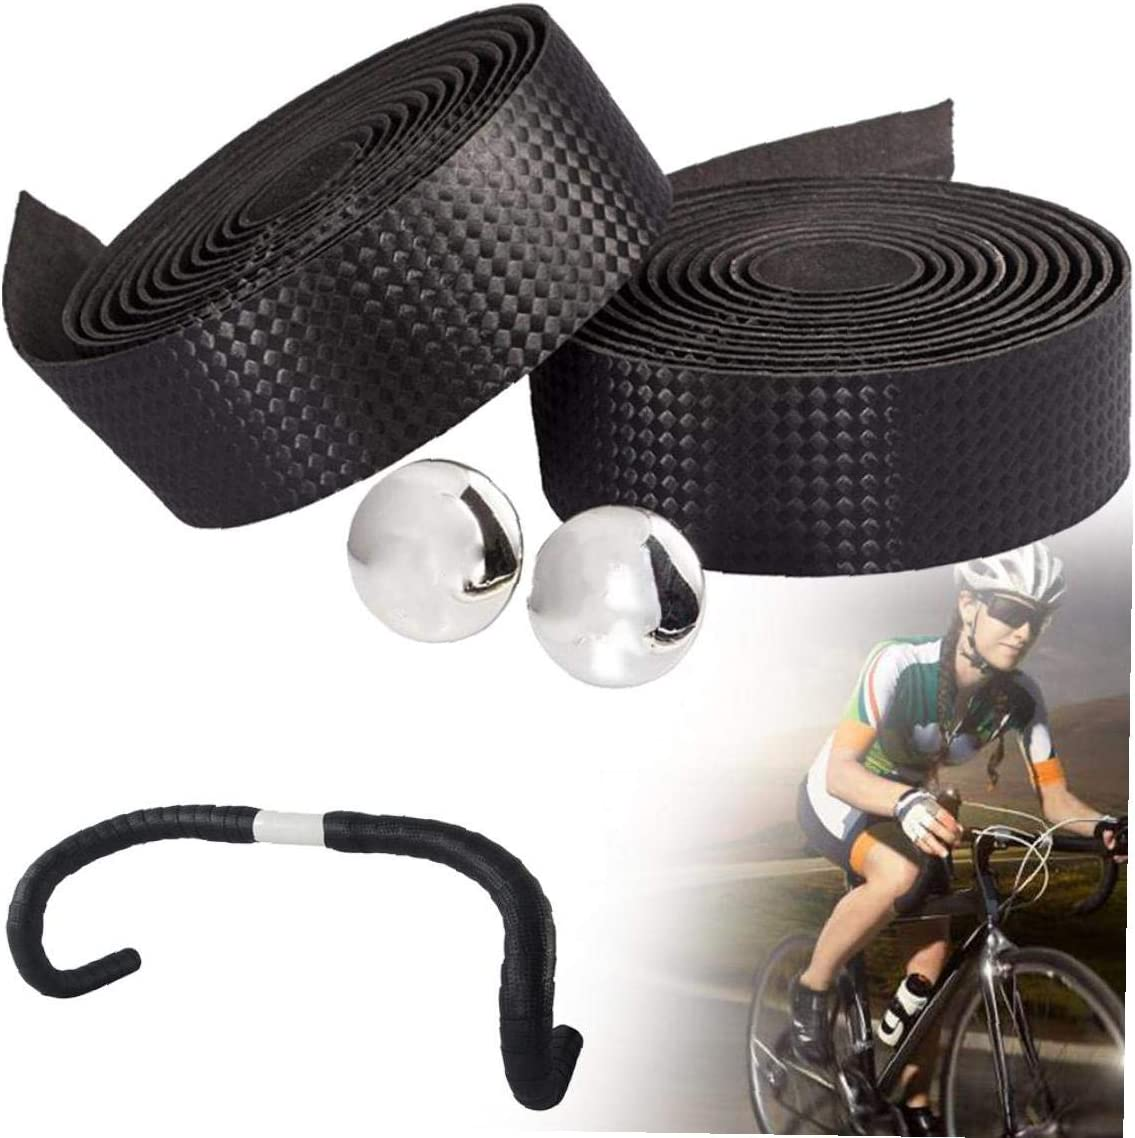 JRXyDfxn Cintas 1 par de Fibra de Carbono Manillar de la Bicicleta Correa Anti de la resbalón Esponja Cinturón de Bicicletas Cinta de Manillar Bicicleta de Carretera Bar con Barra de enchufes (